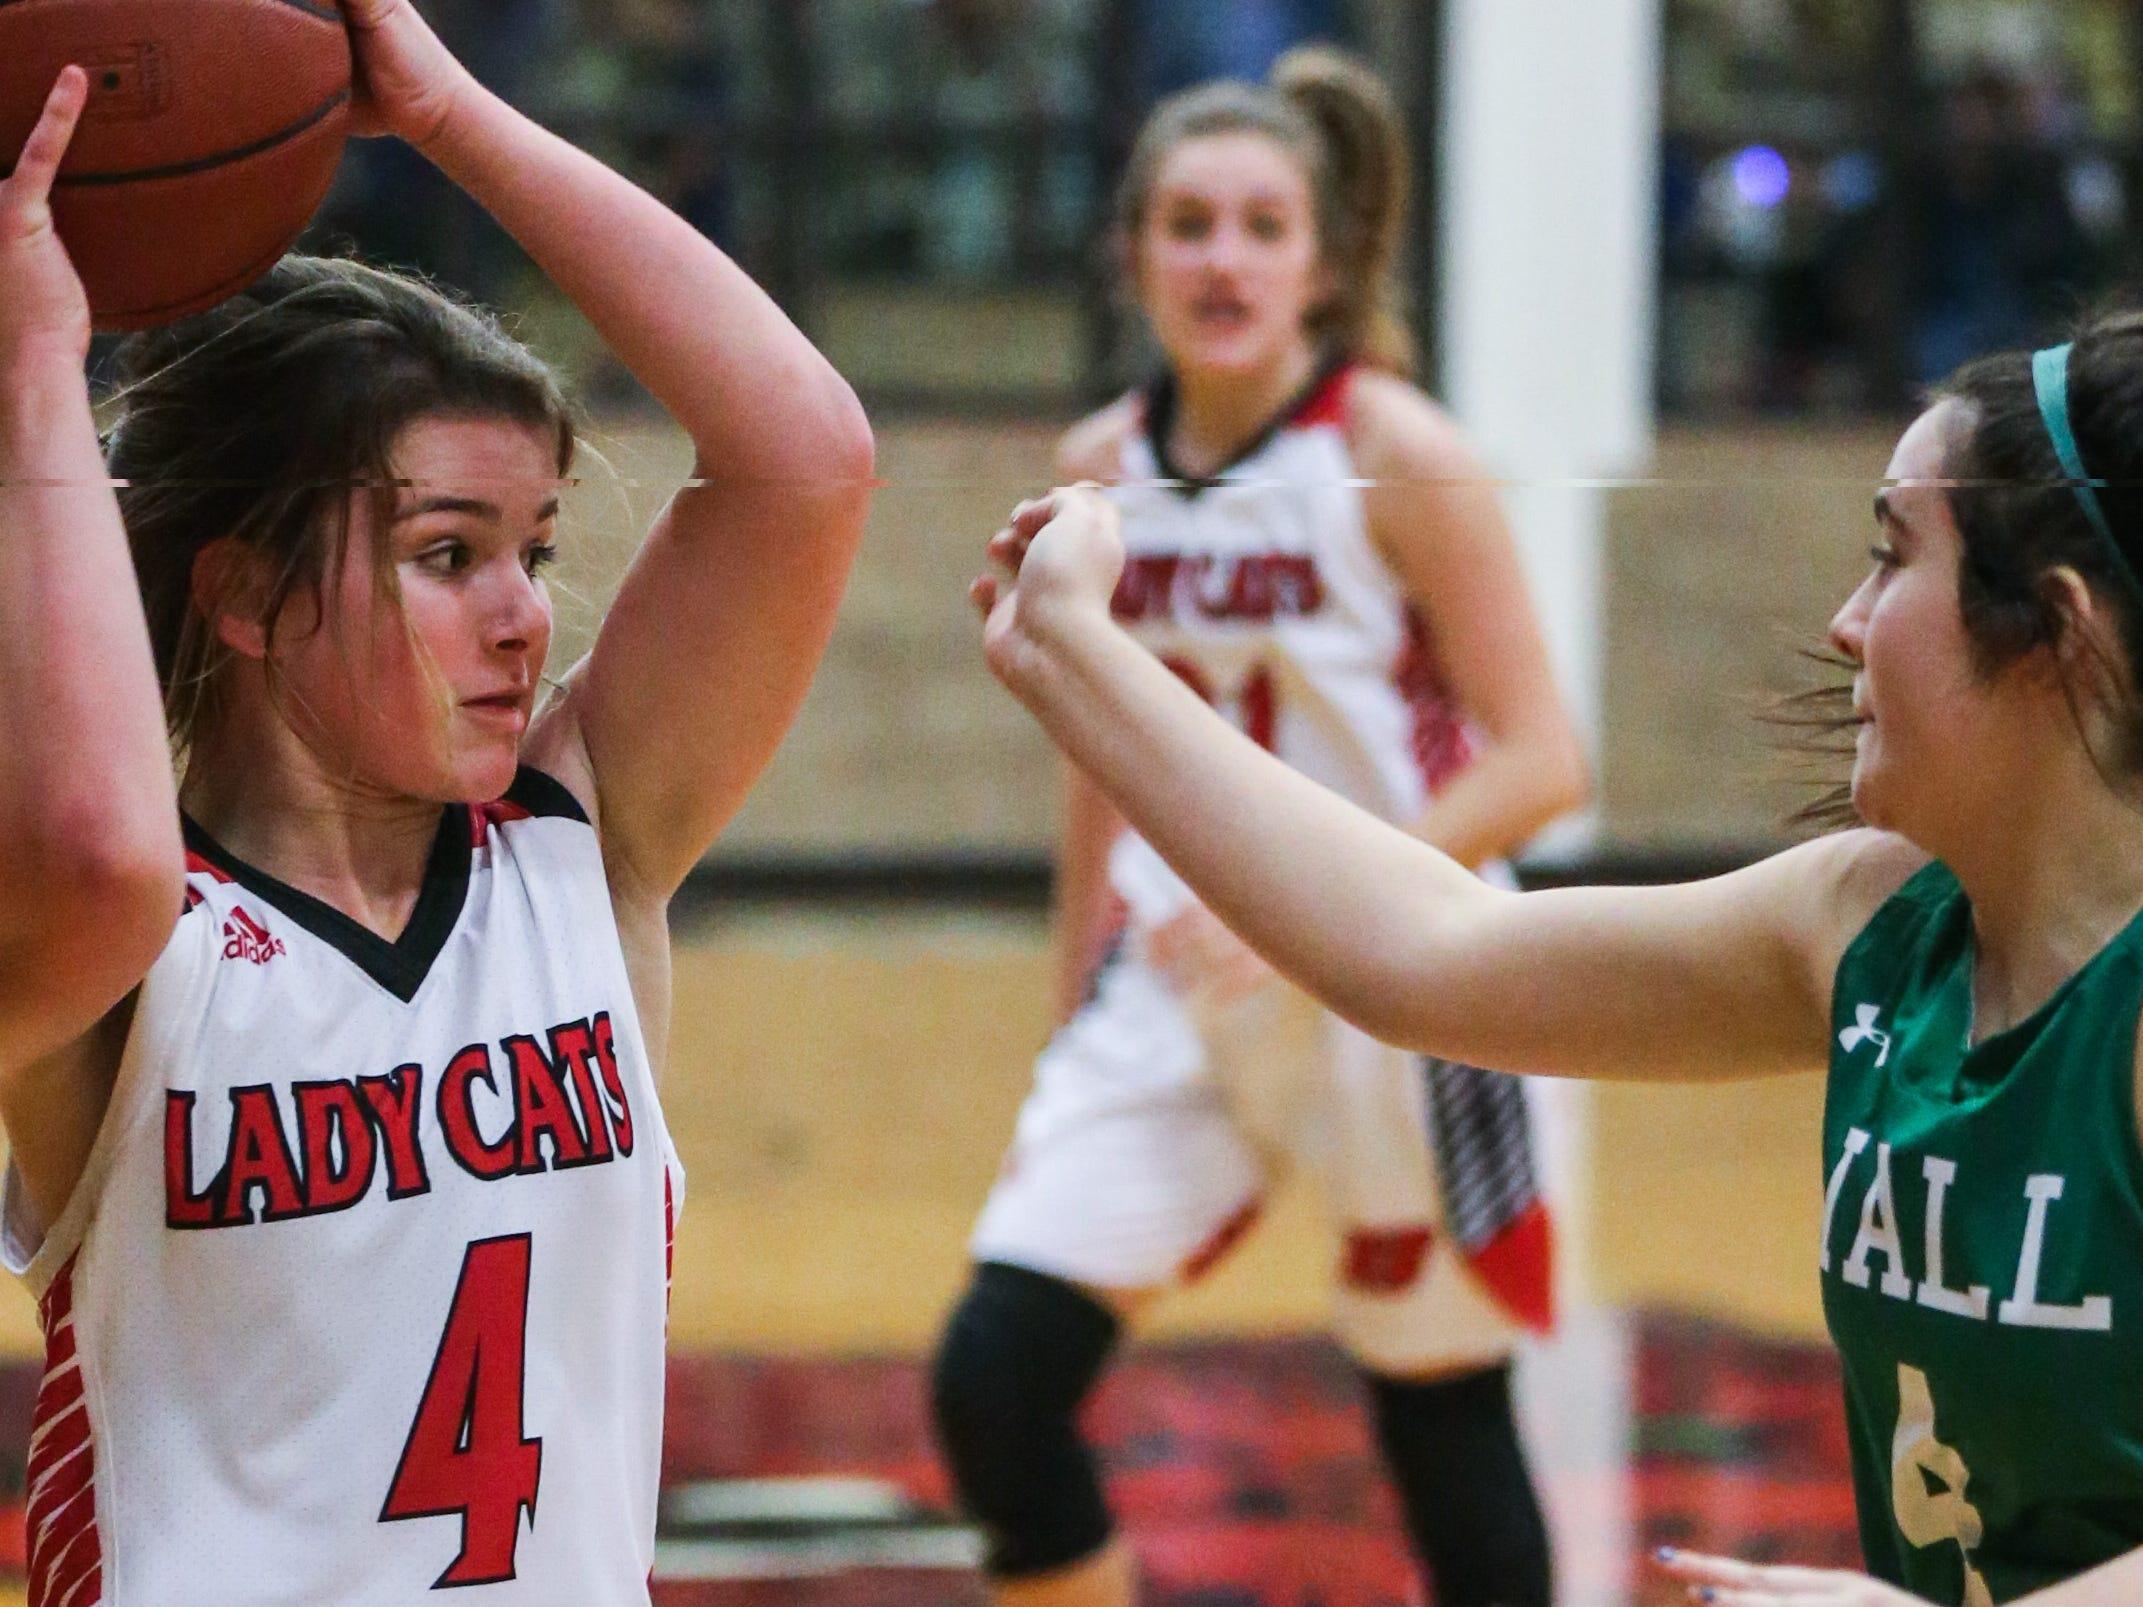 Ballinger's Jenna Battle looks to pass against Wall Tuesday, Jan. 8, 2019, in Ballinger High School.